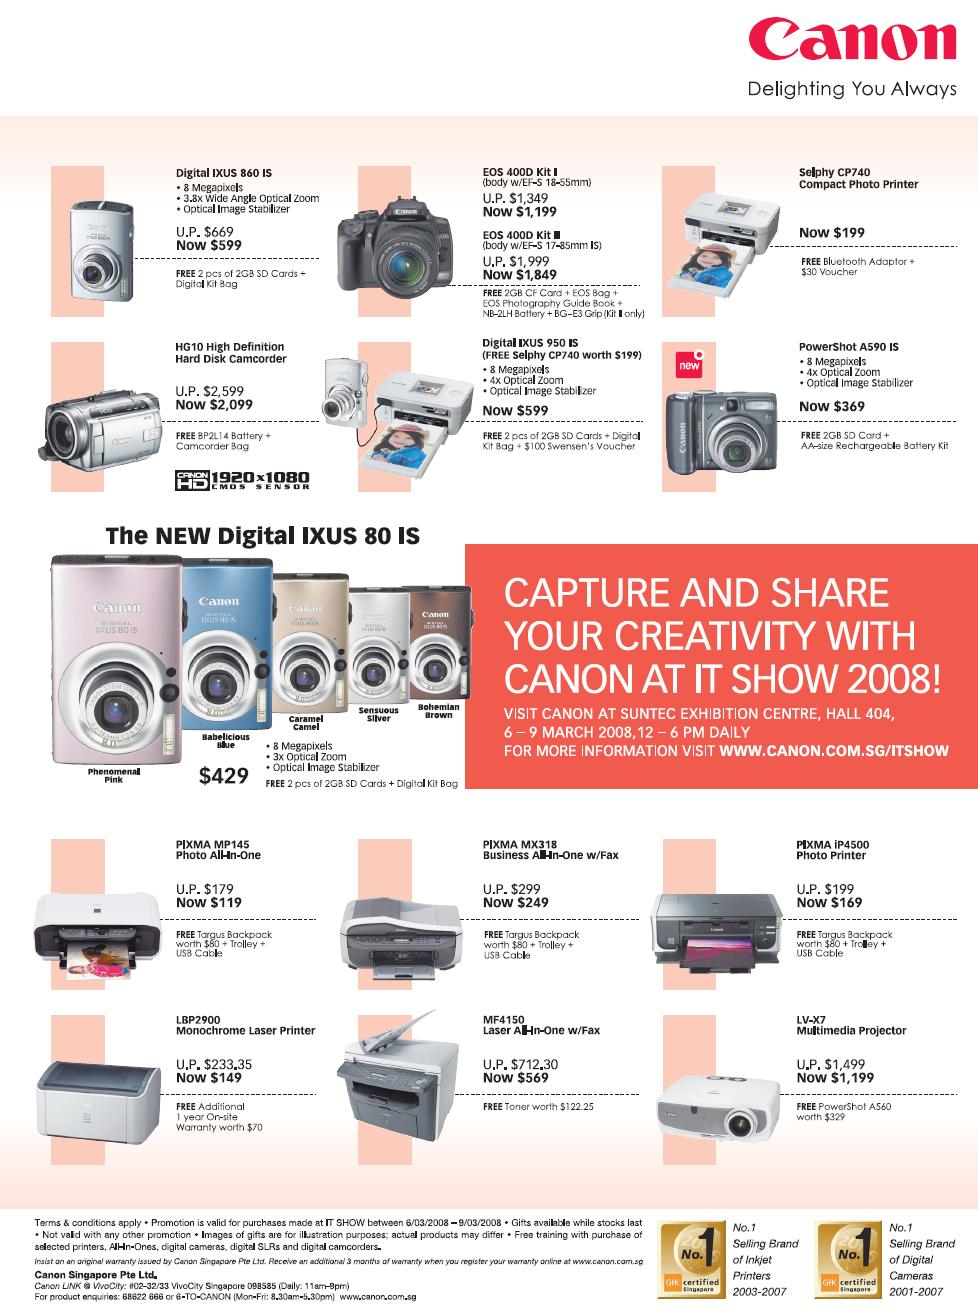 IT Show 2008 price list image brochure of Canon Digital Cameras Camcorders Ixus PowerShot Pixma Printers Inkjet Laser Photo